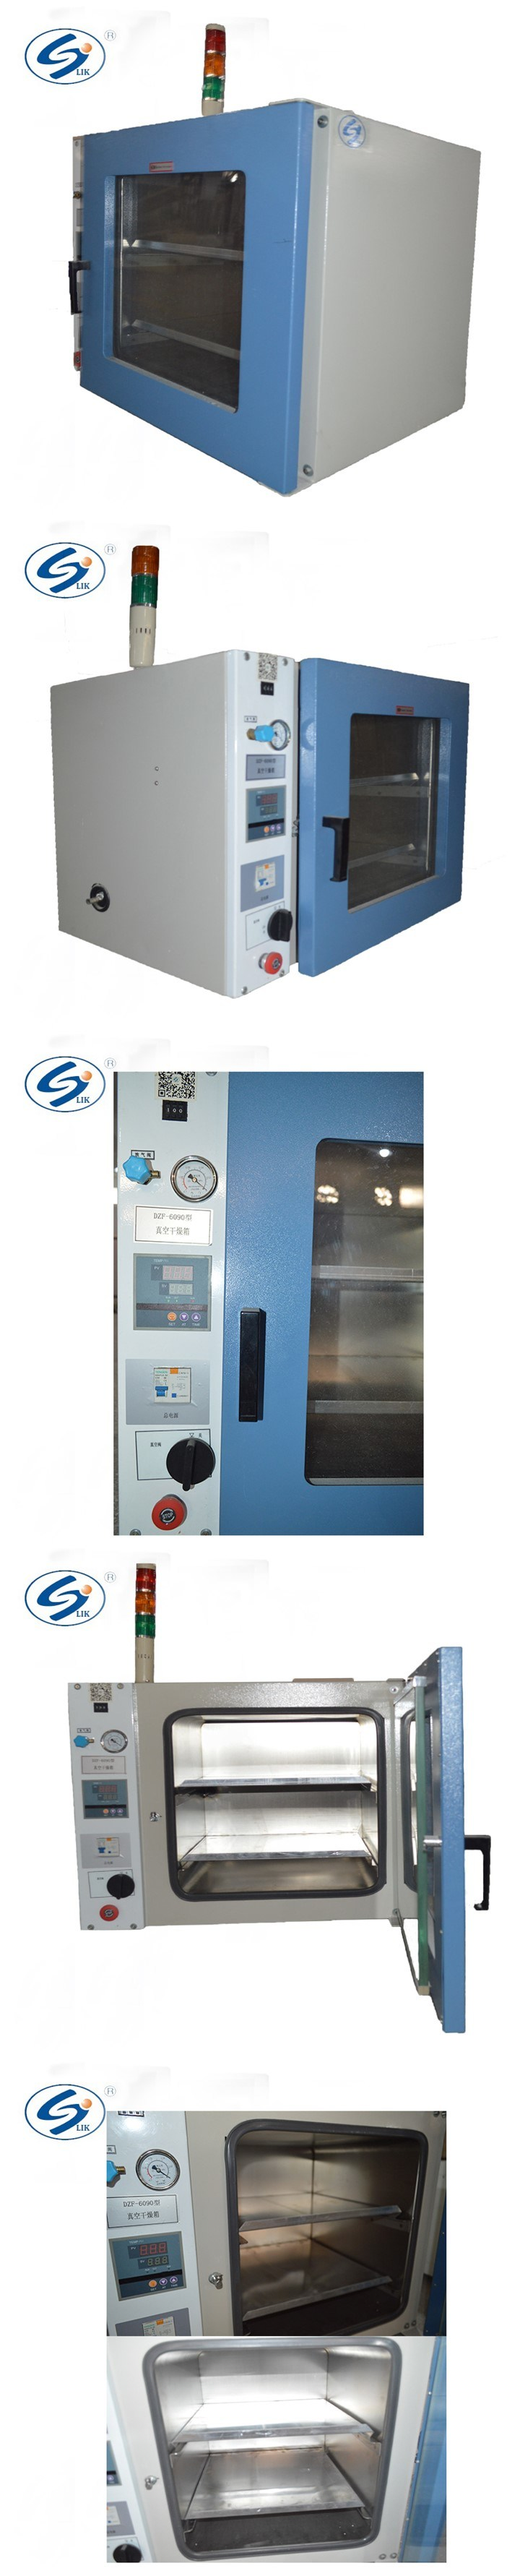 Digital Display Industry Vacuum Drying Cabinet